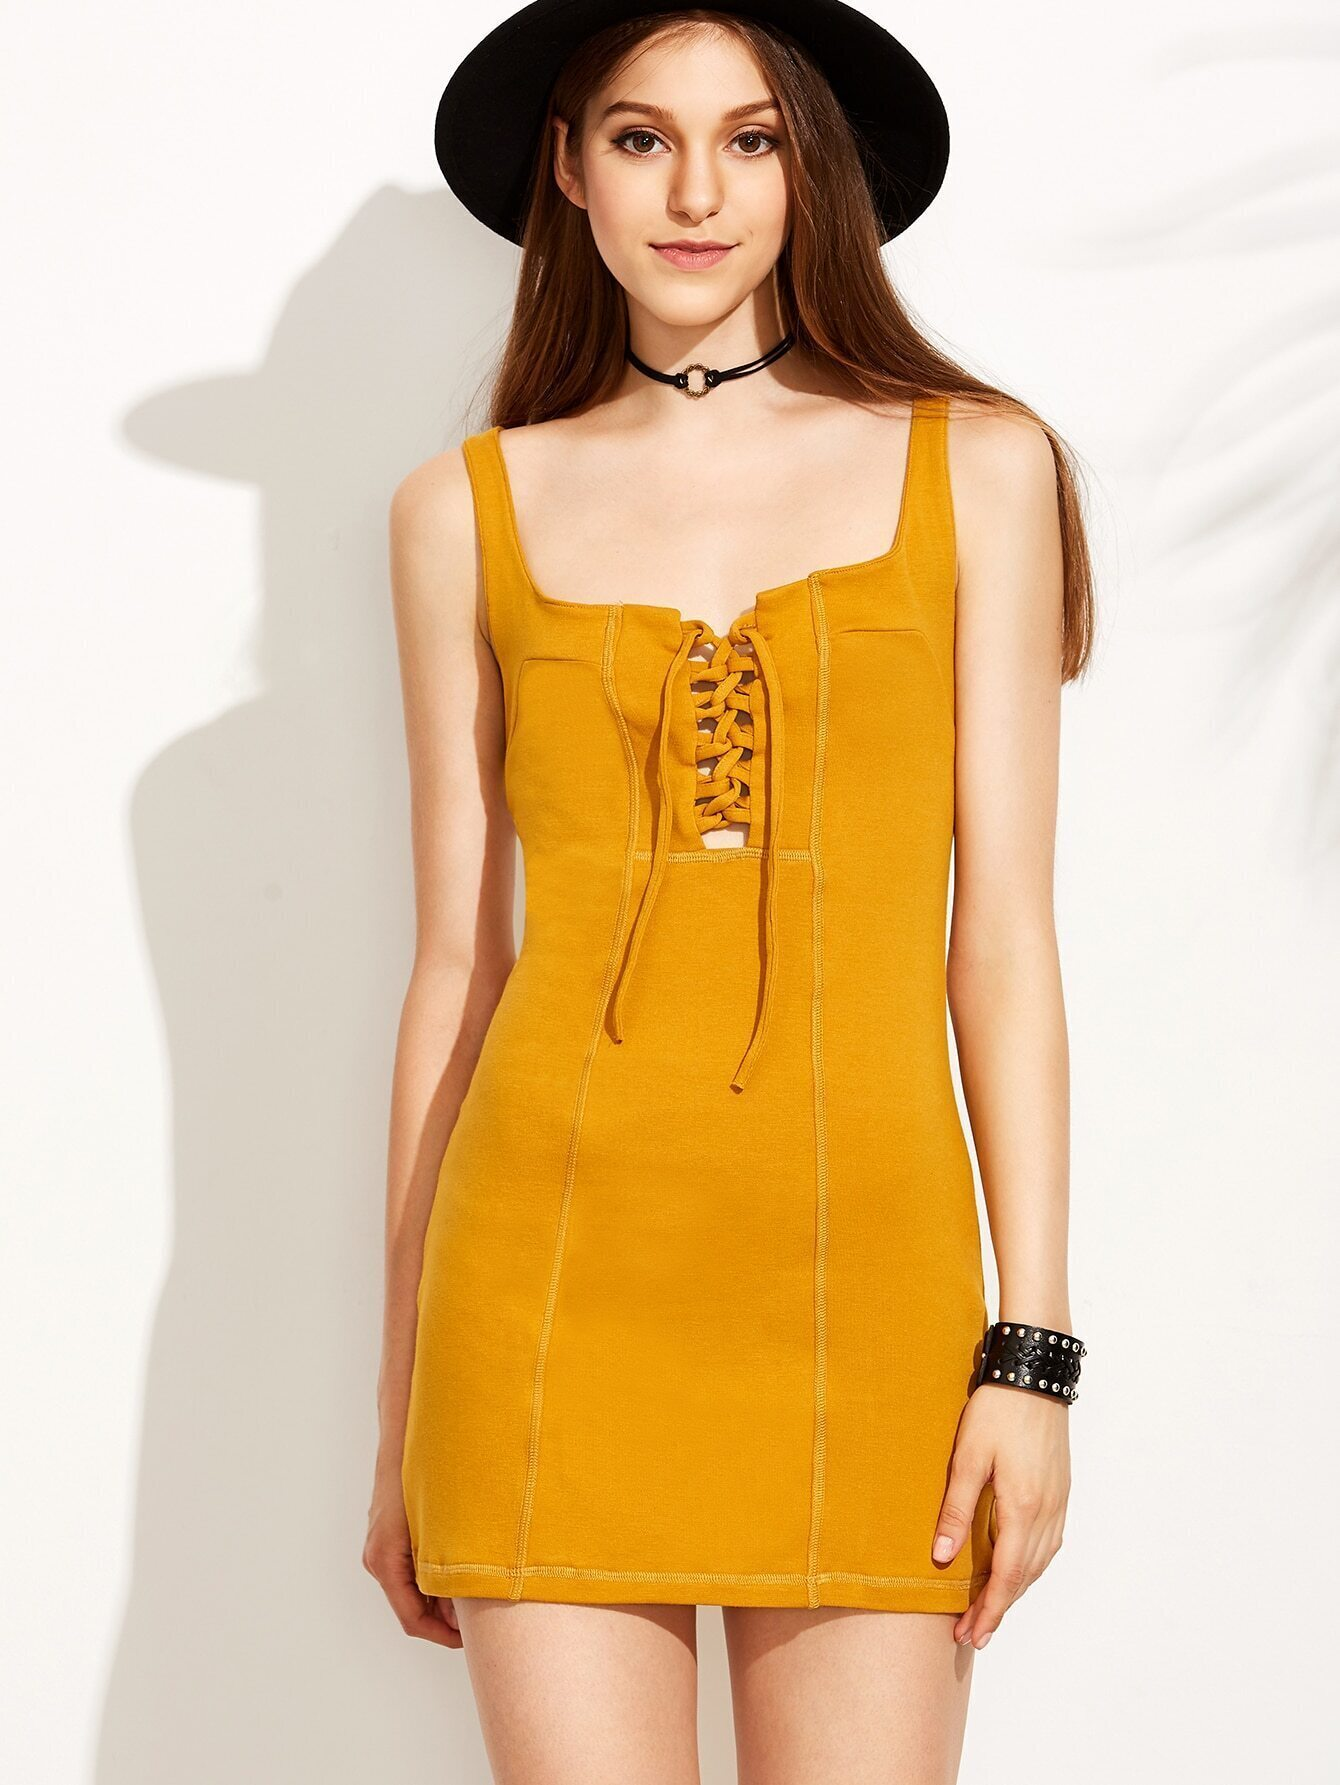 e7d87a7f459 Yellow Lace Up V Back Sheath Dress EmmaCloth-Women Fast Fashion Online